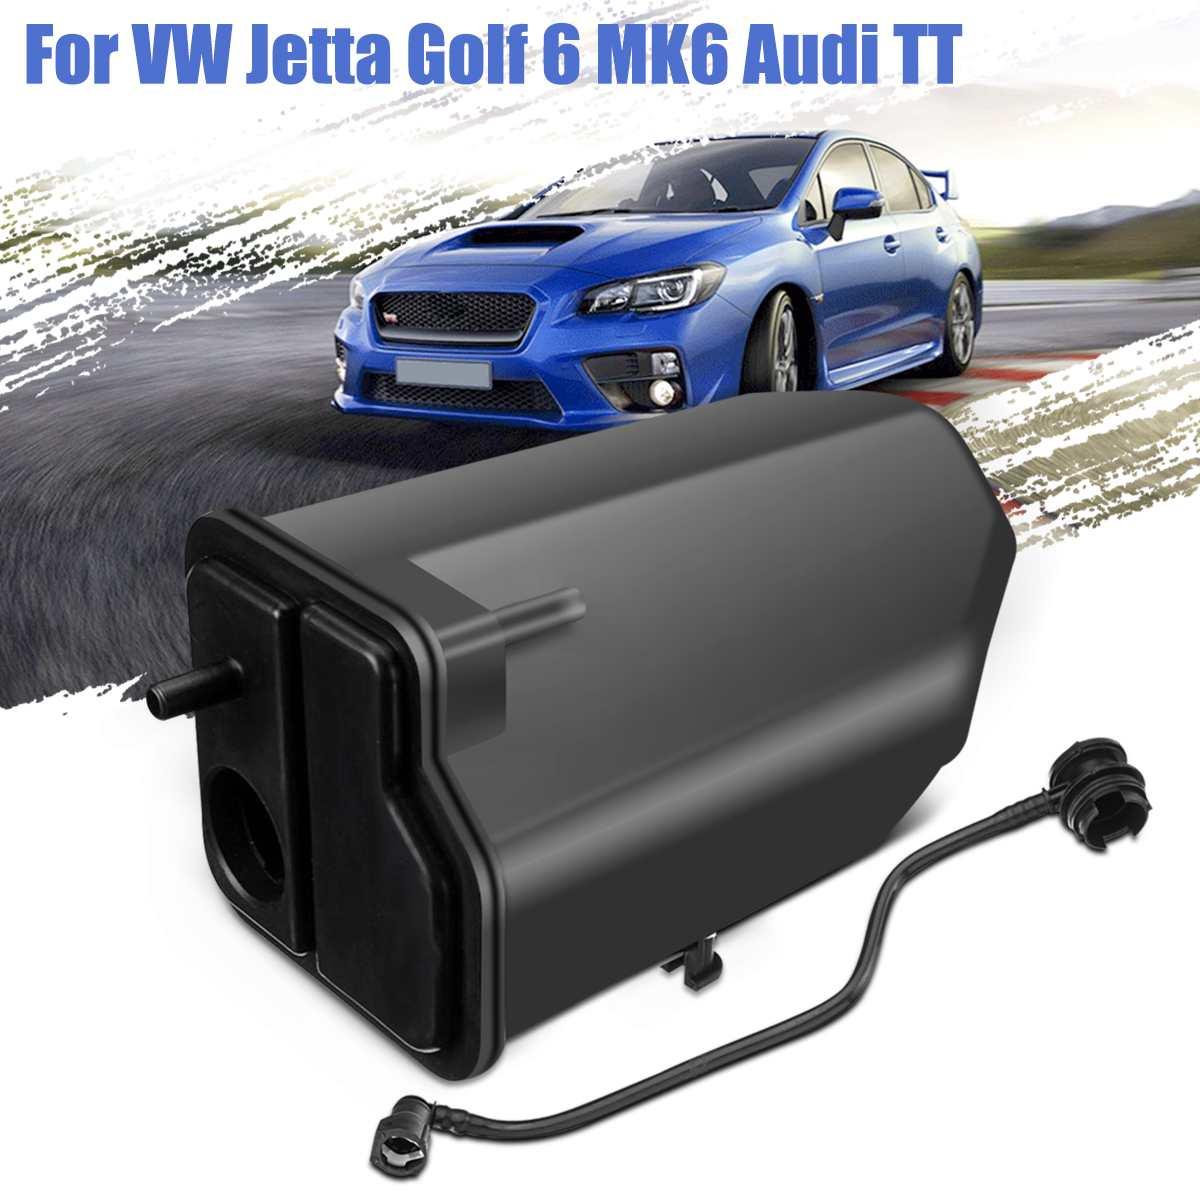 1K0201897AE 1K0201801E araba aktif karbon kömür teneke kutu kutular VW/Jetta Golf EOS Audi A3 TT